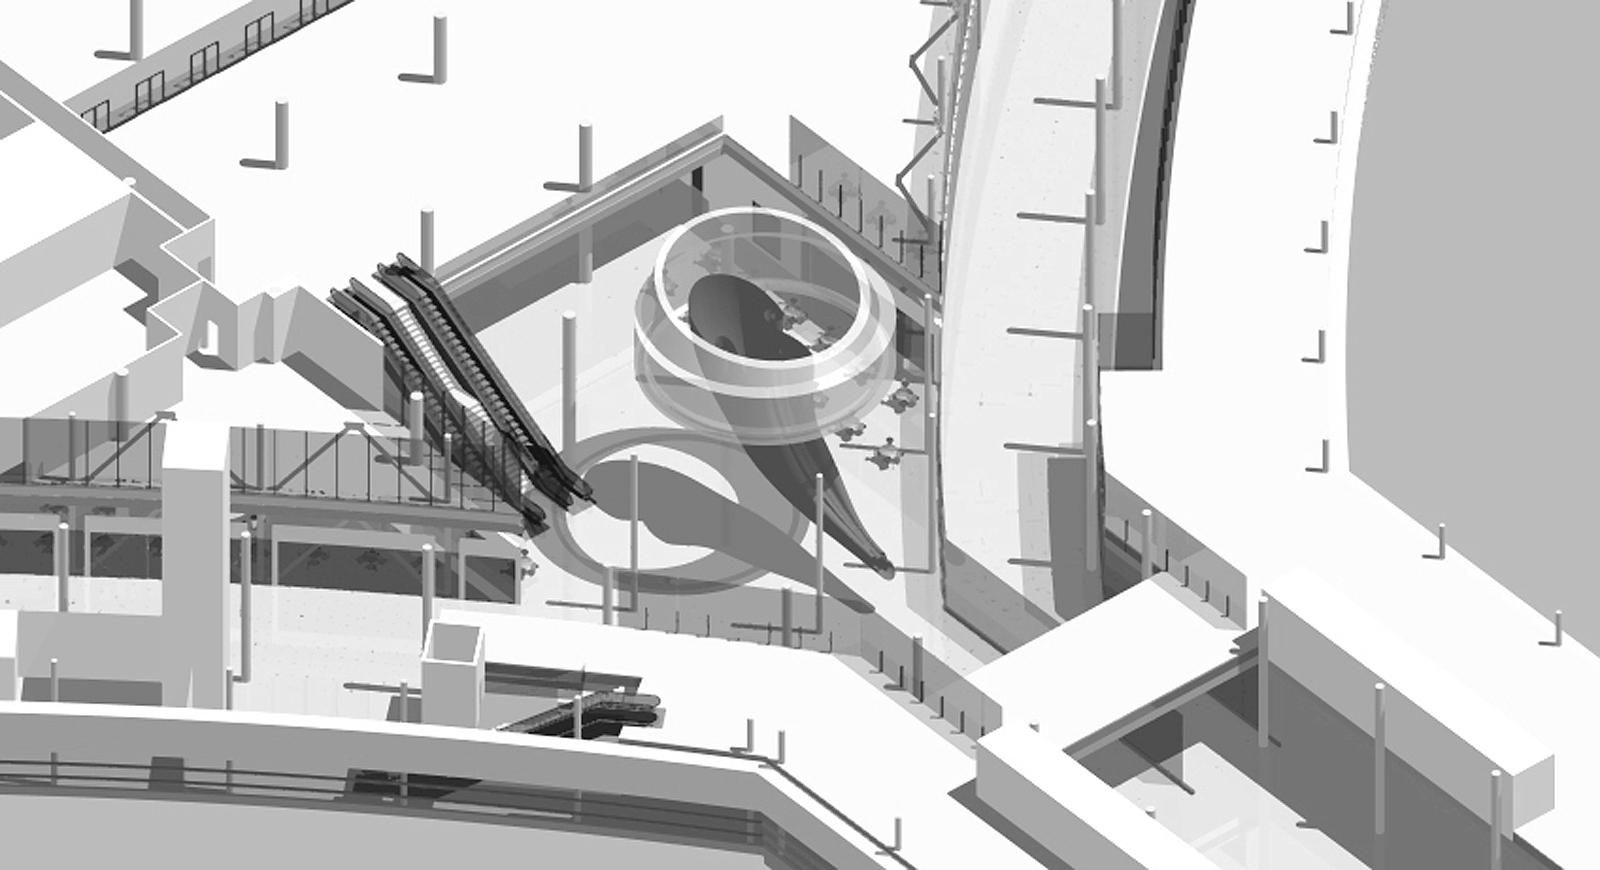 Dereck Revington Studio - Skin of fLight 1 - From Above